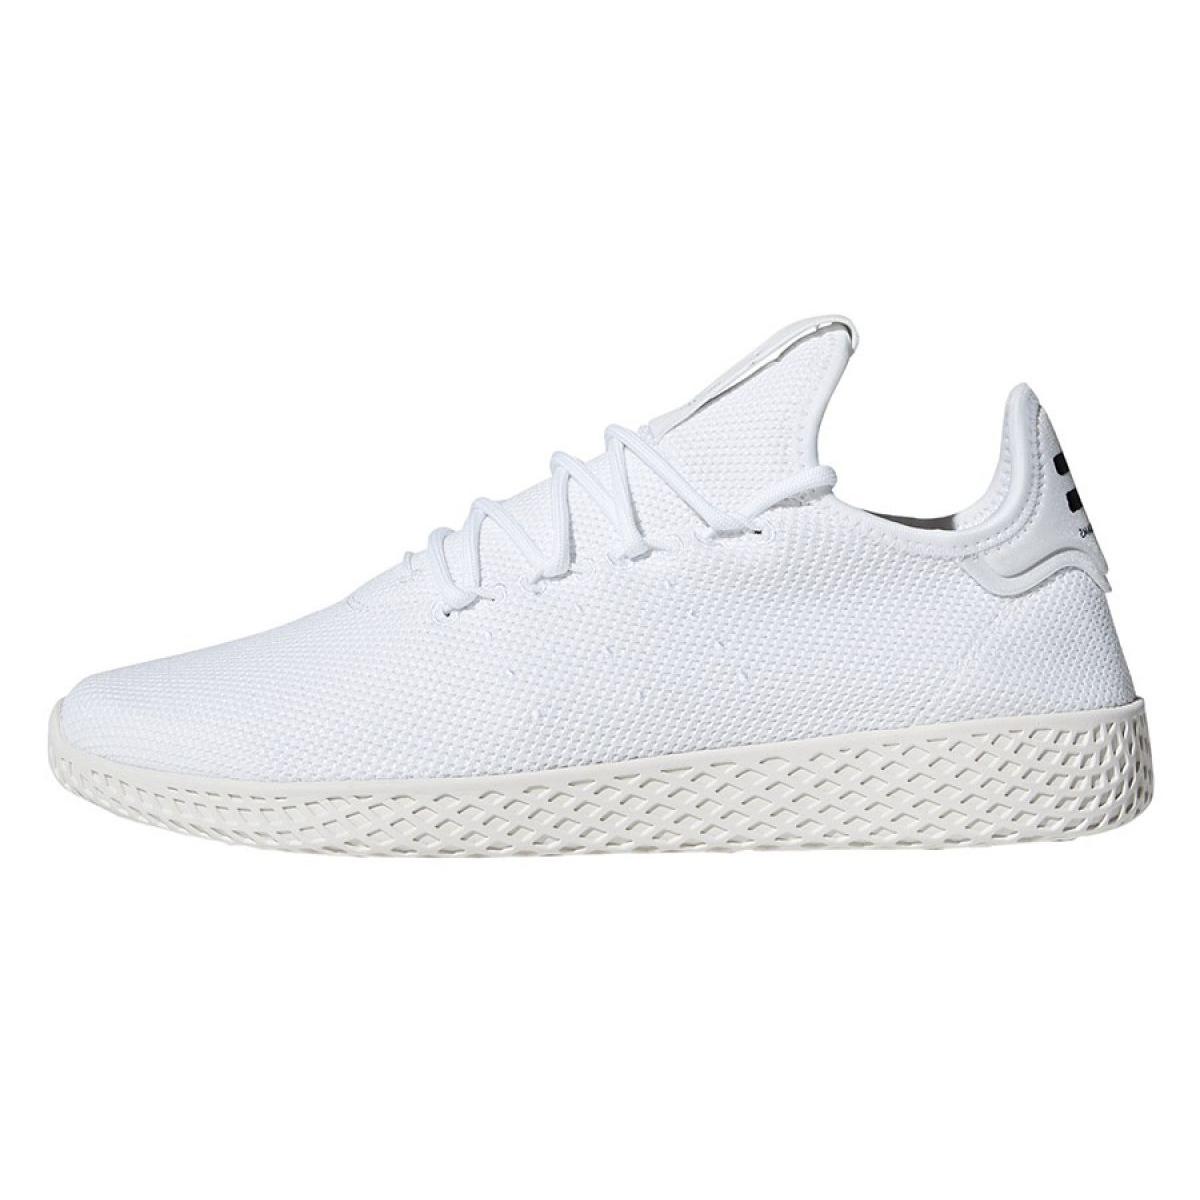 8f585b26 Hvid Adidas Originals Pharrell Williams Tennis Hu M B41792 sko ...